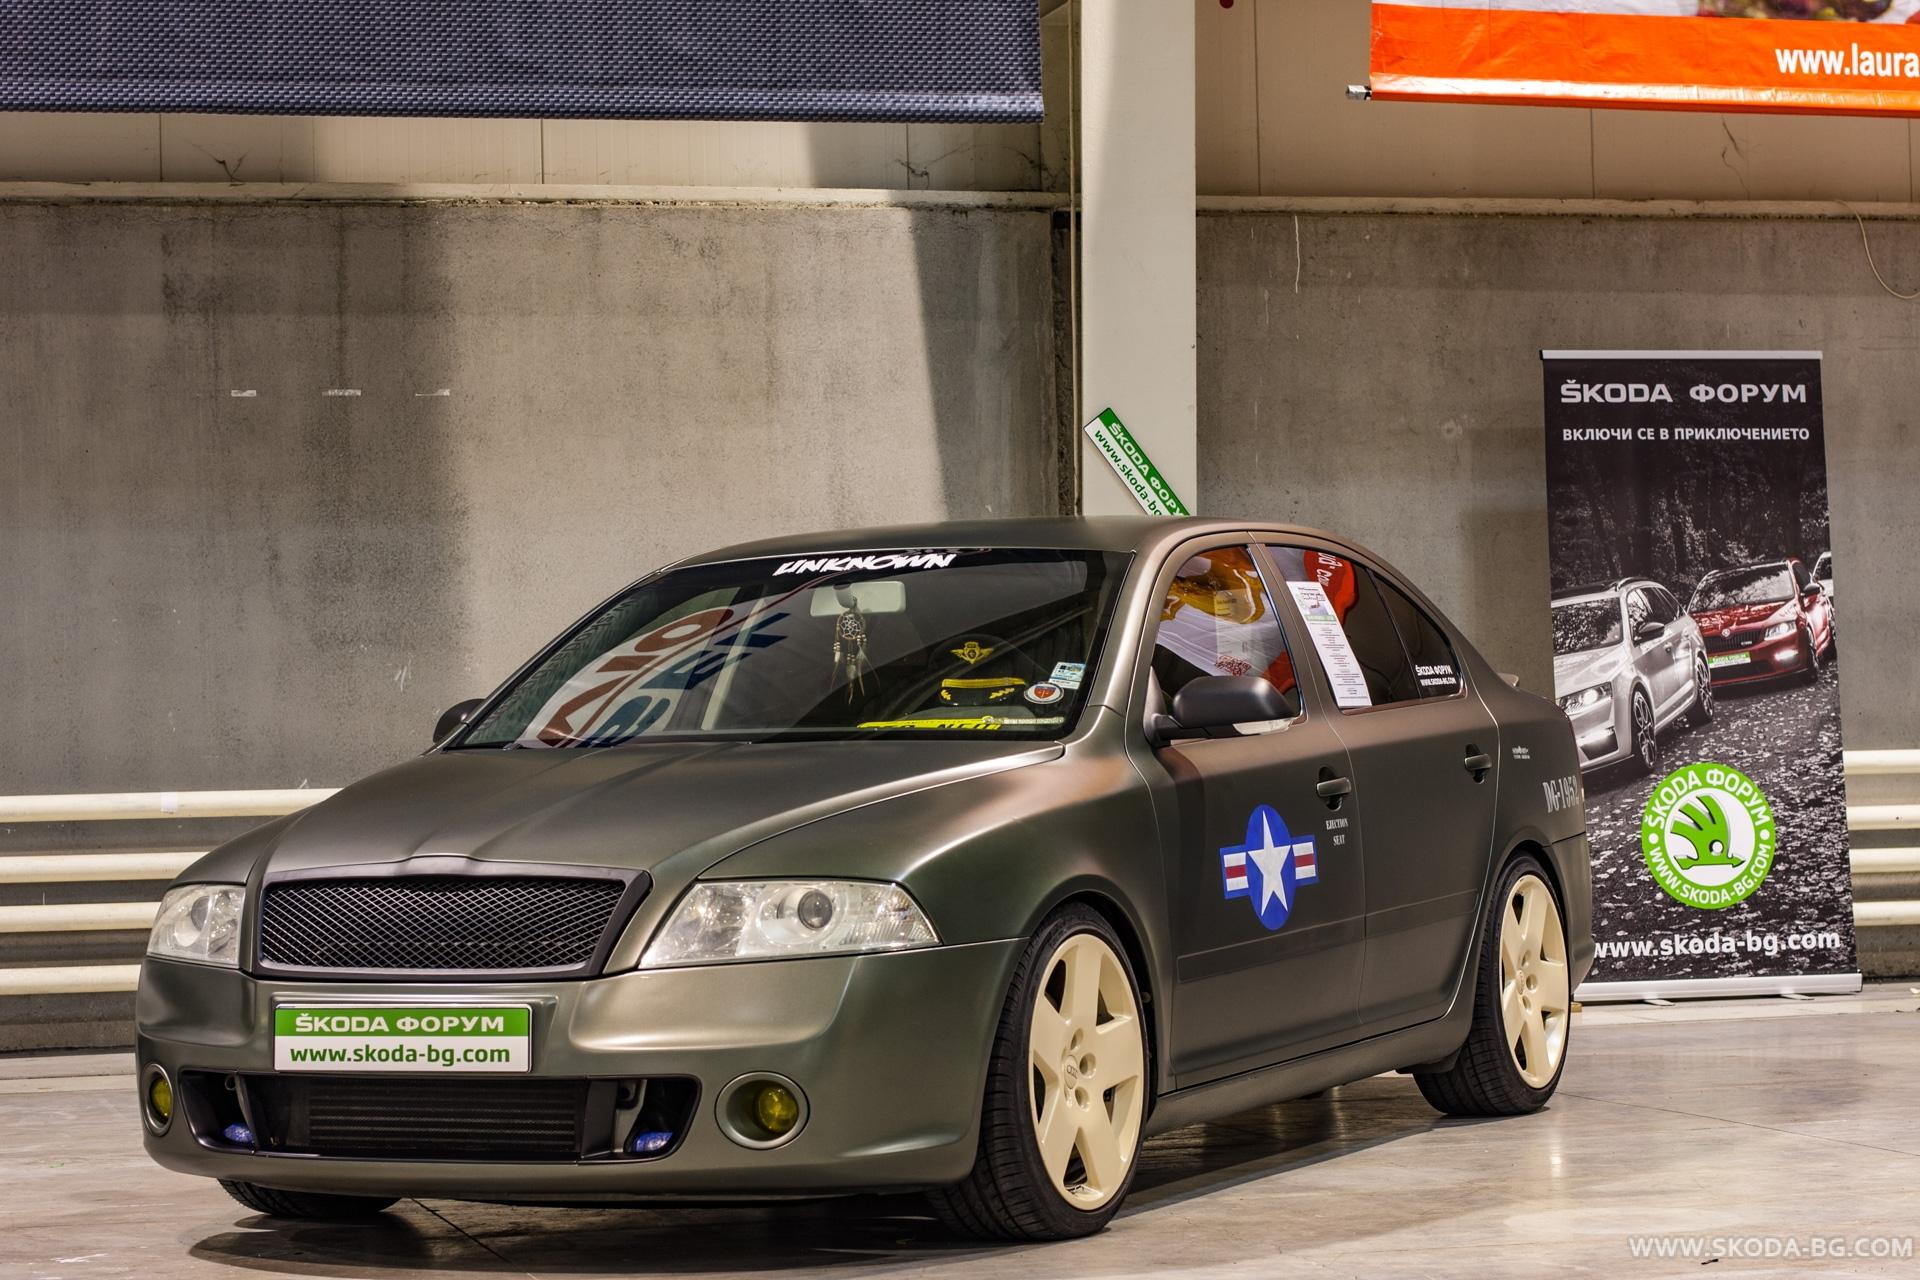 Škoda Octavia Mk1 1.9 TDI - Драгос